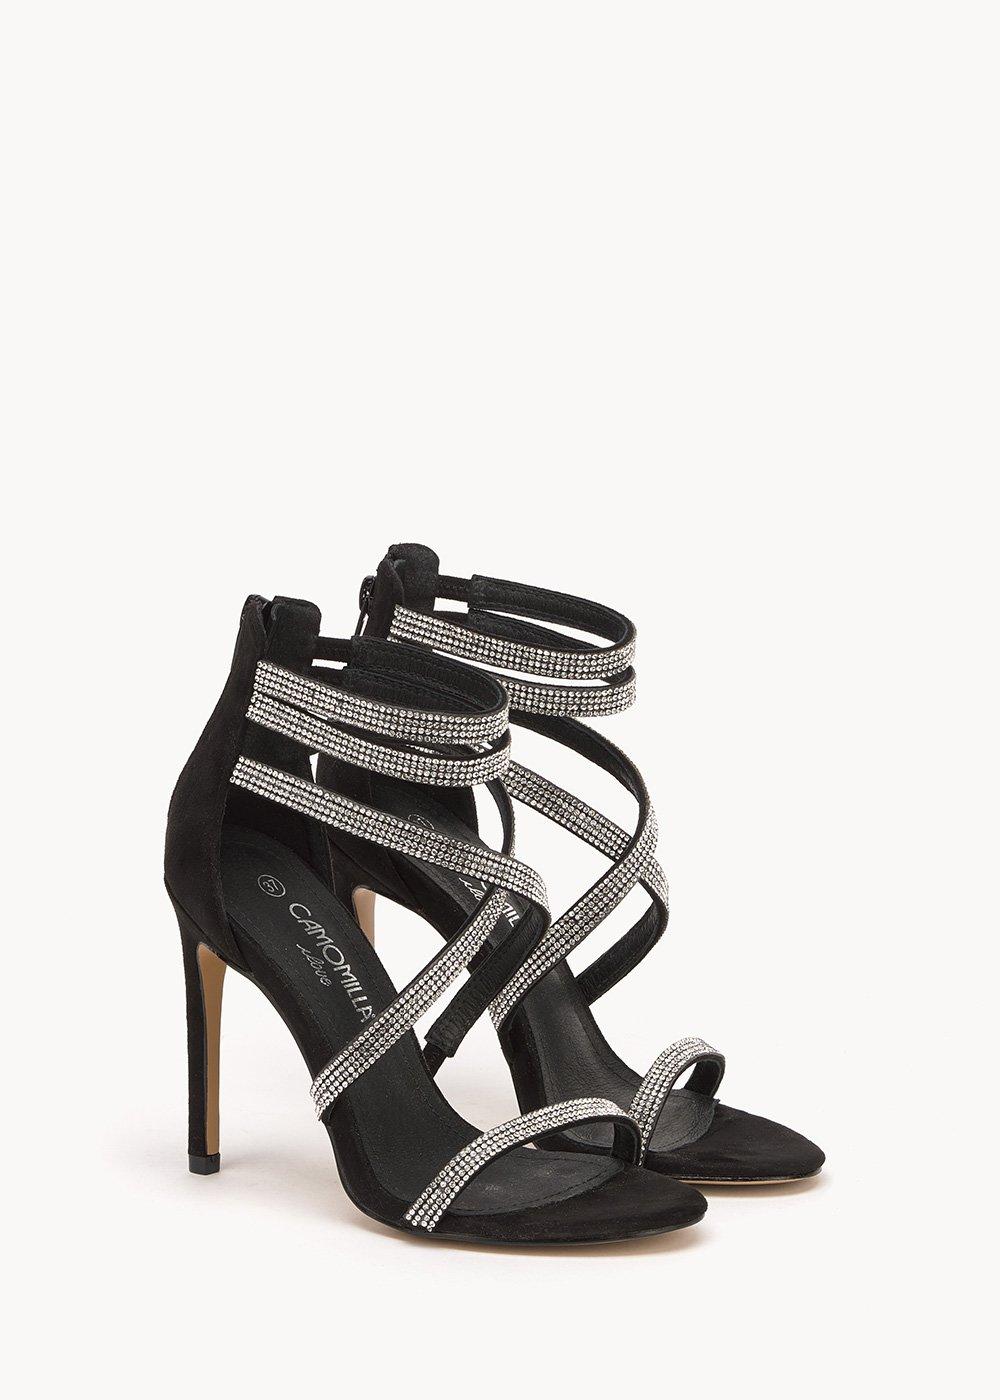 Shyla sandals with rhinestone details - Black - Woman